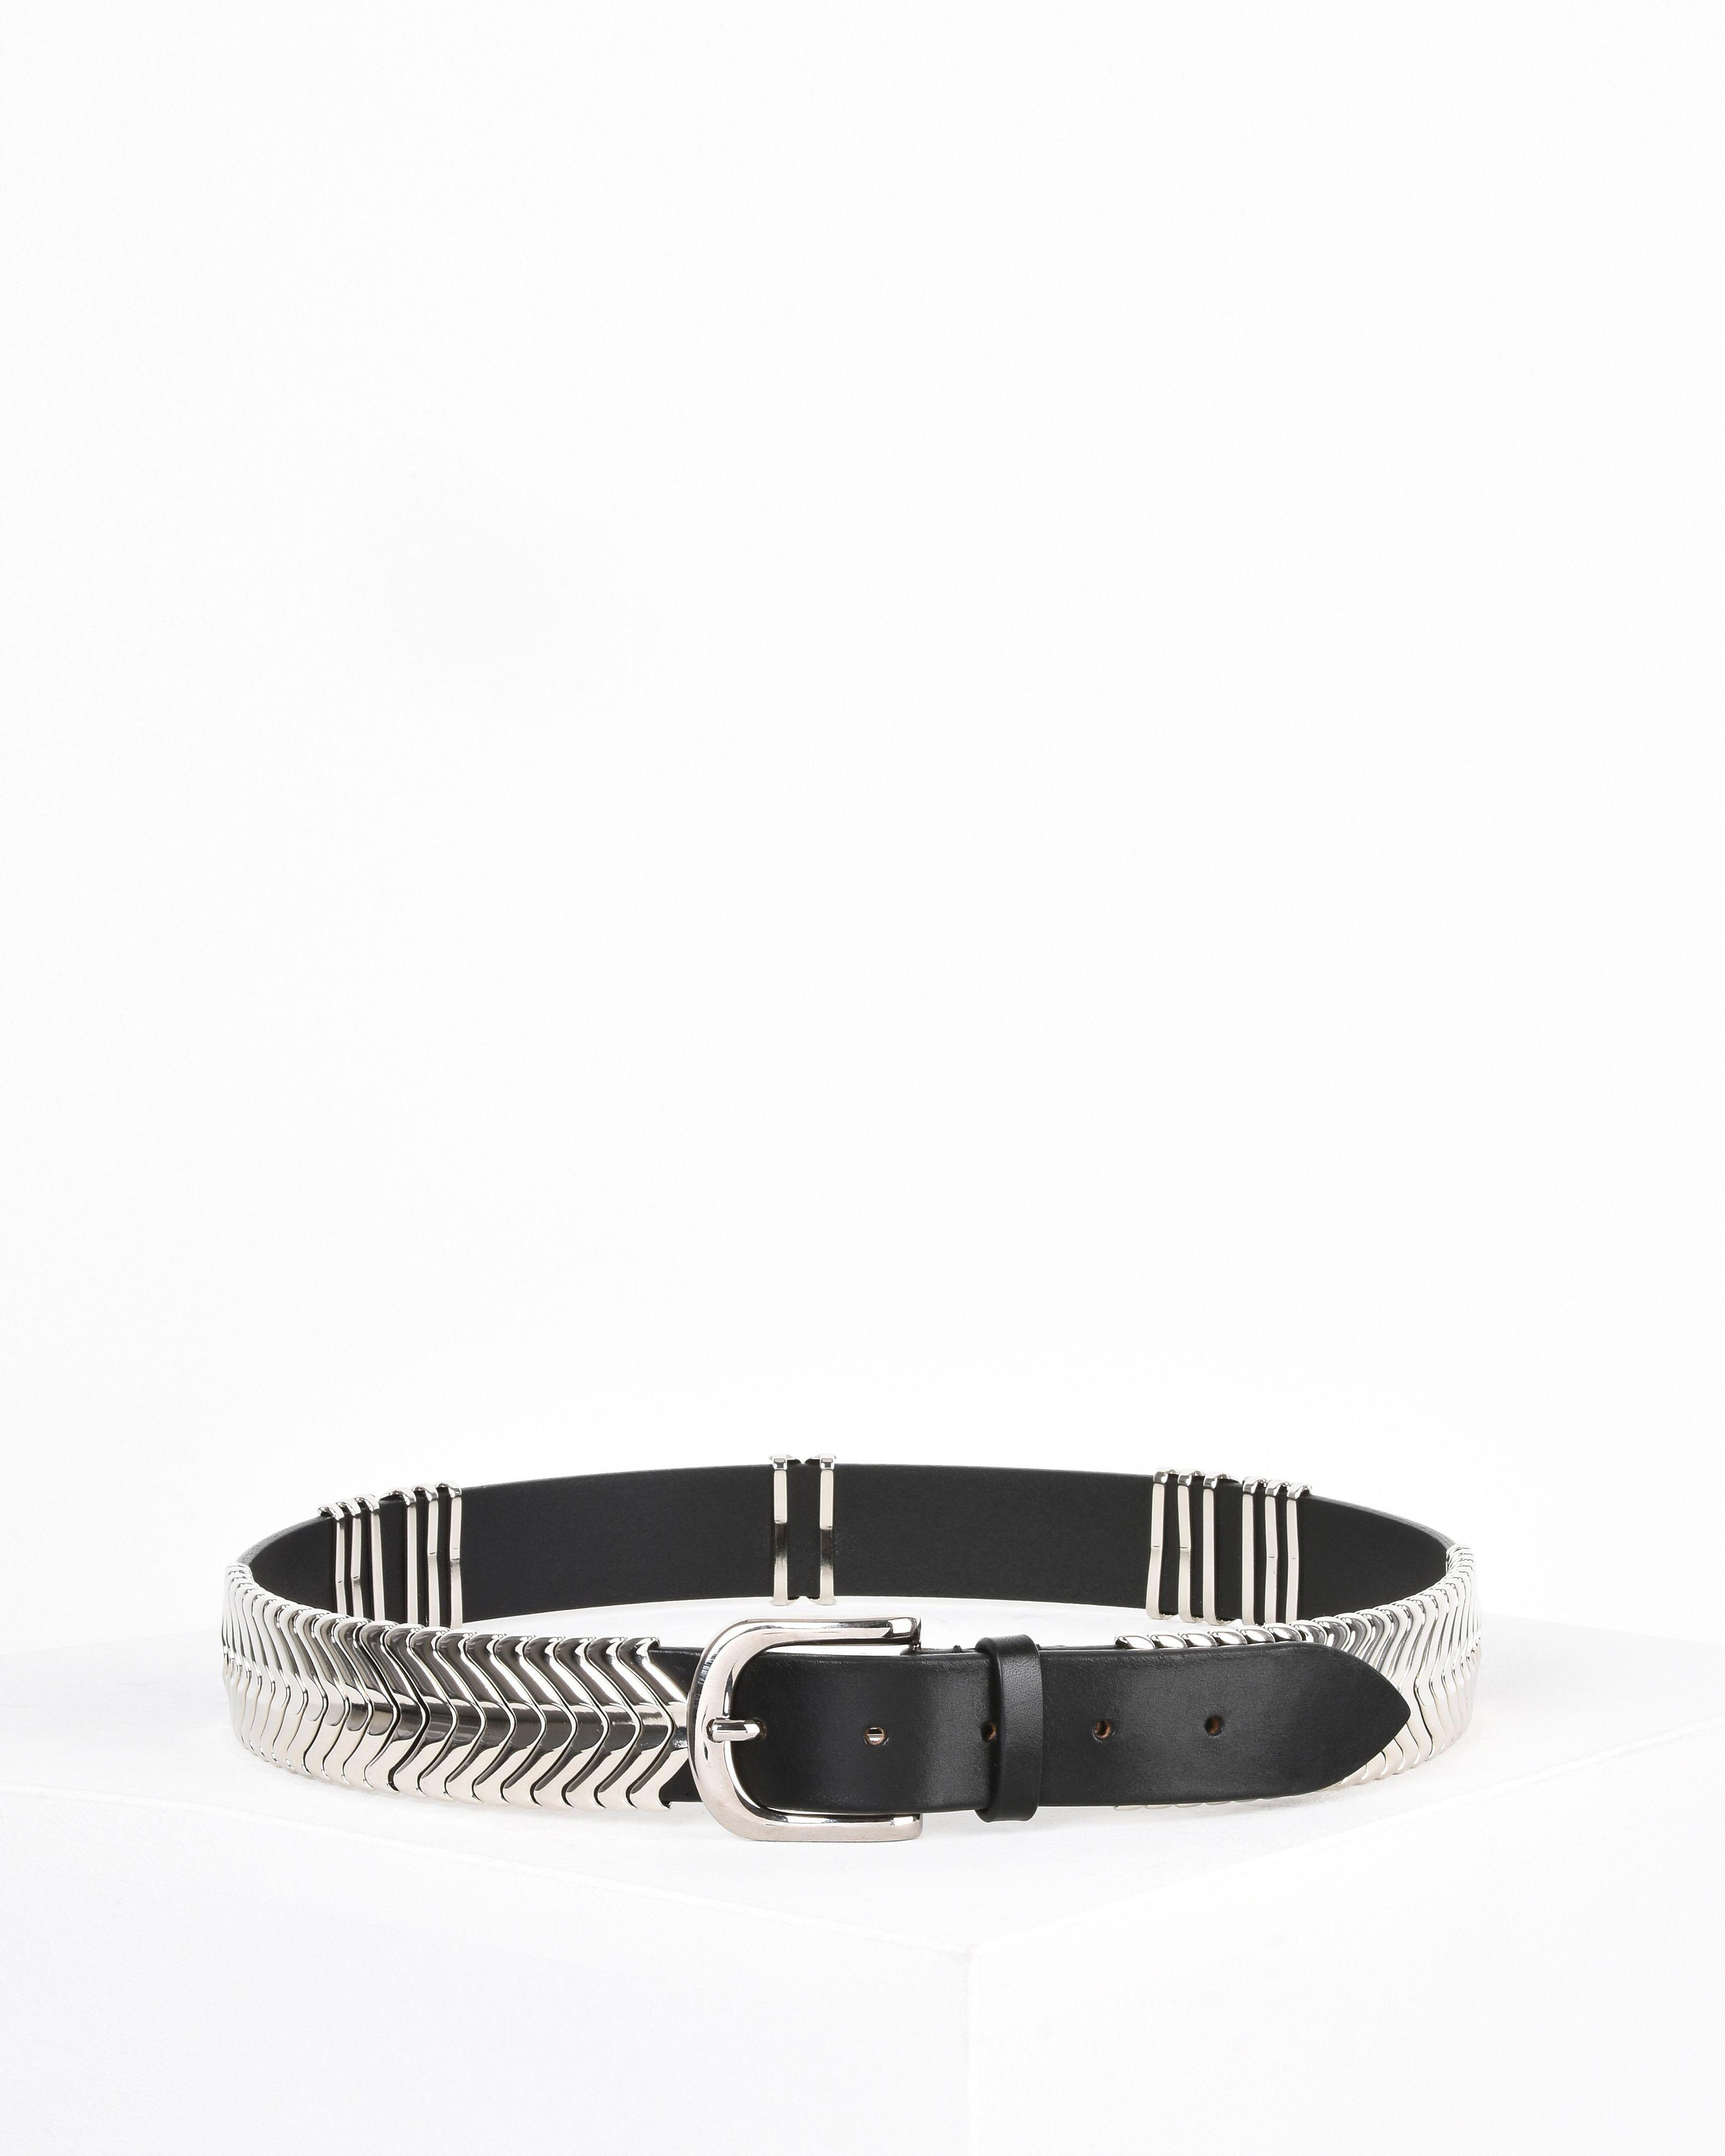 Tehora Embellished Leather Belt - Silver Isabel Marant BAcInox